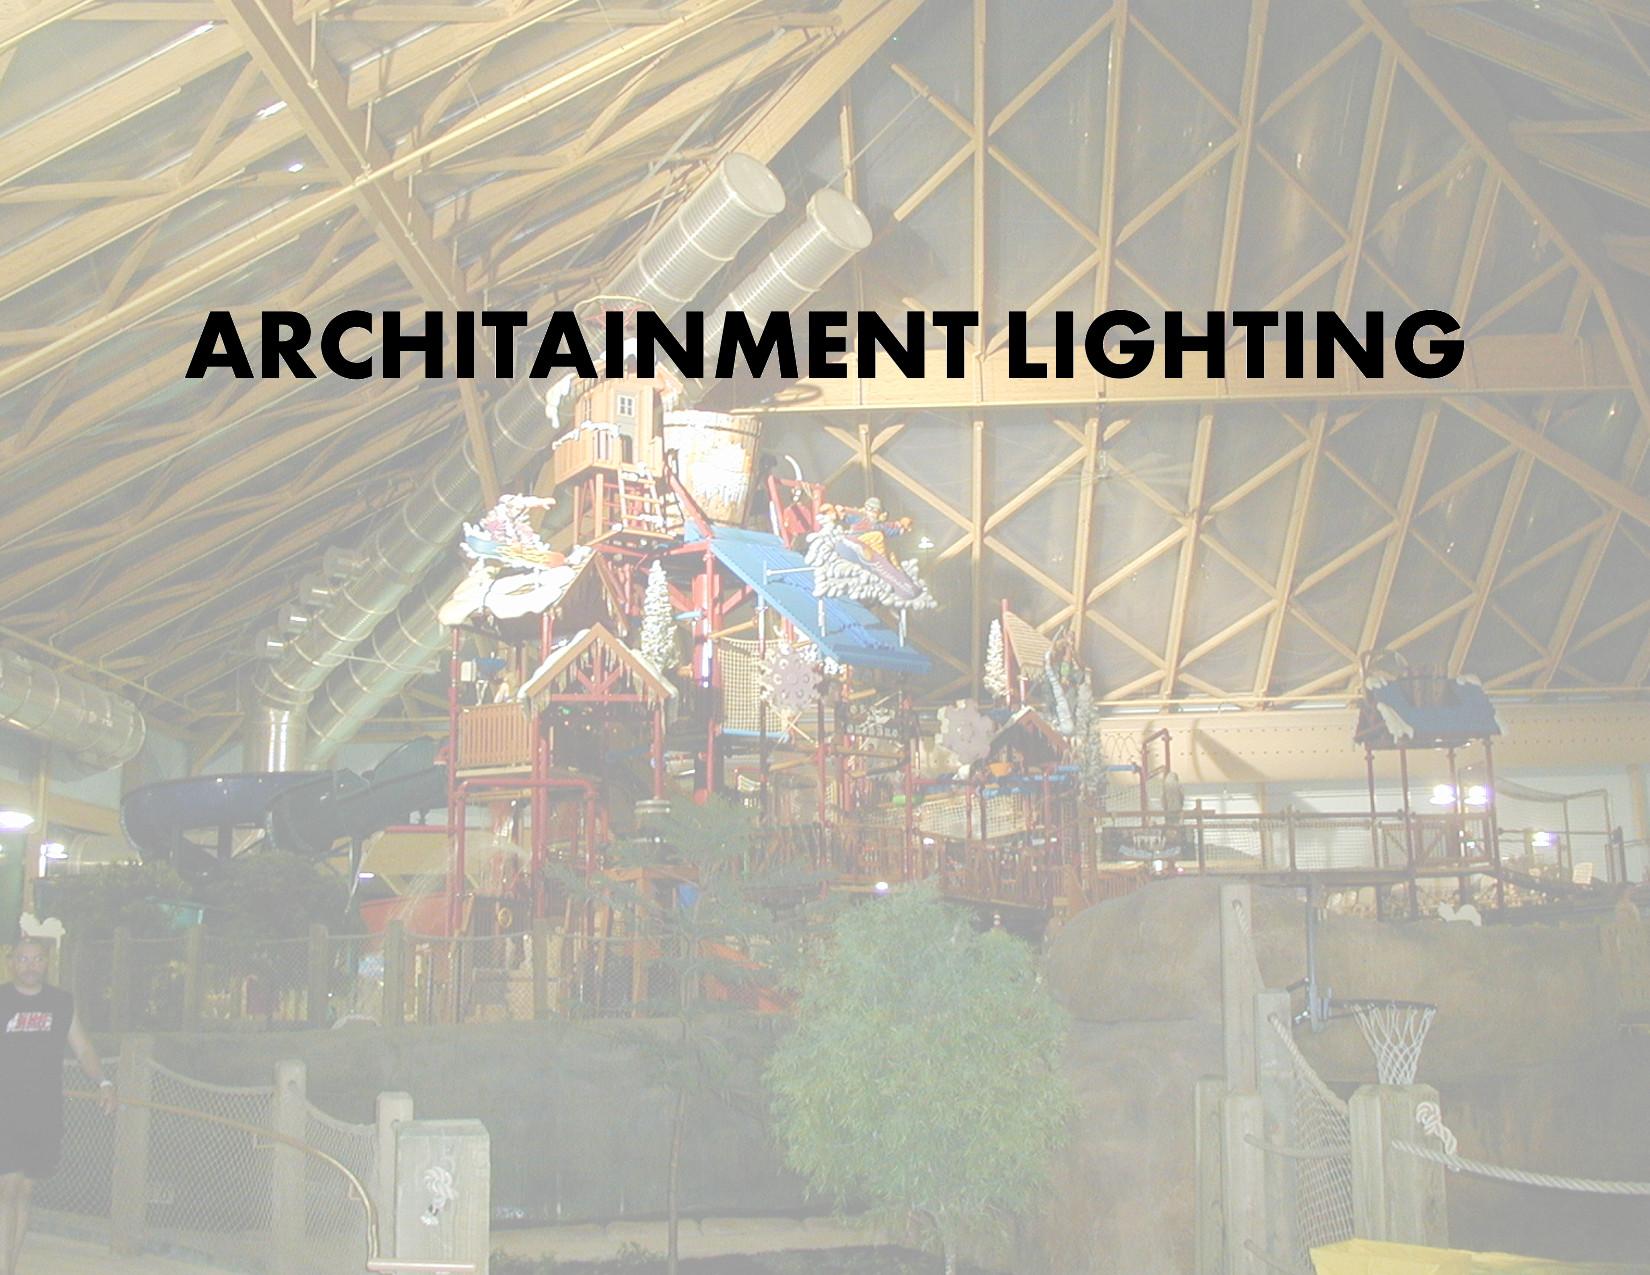 Architainment Lighting